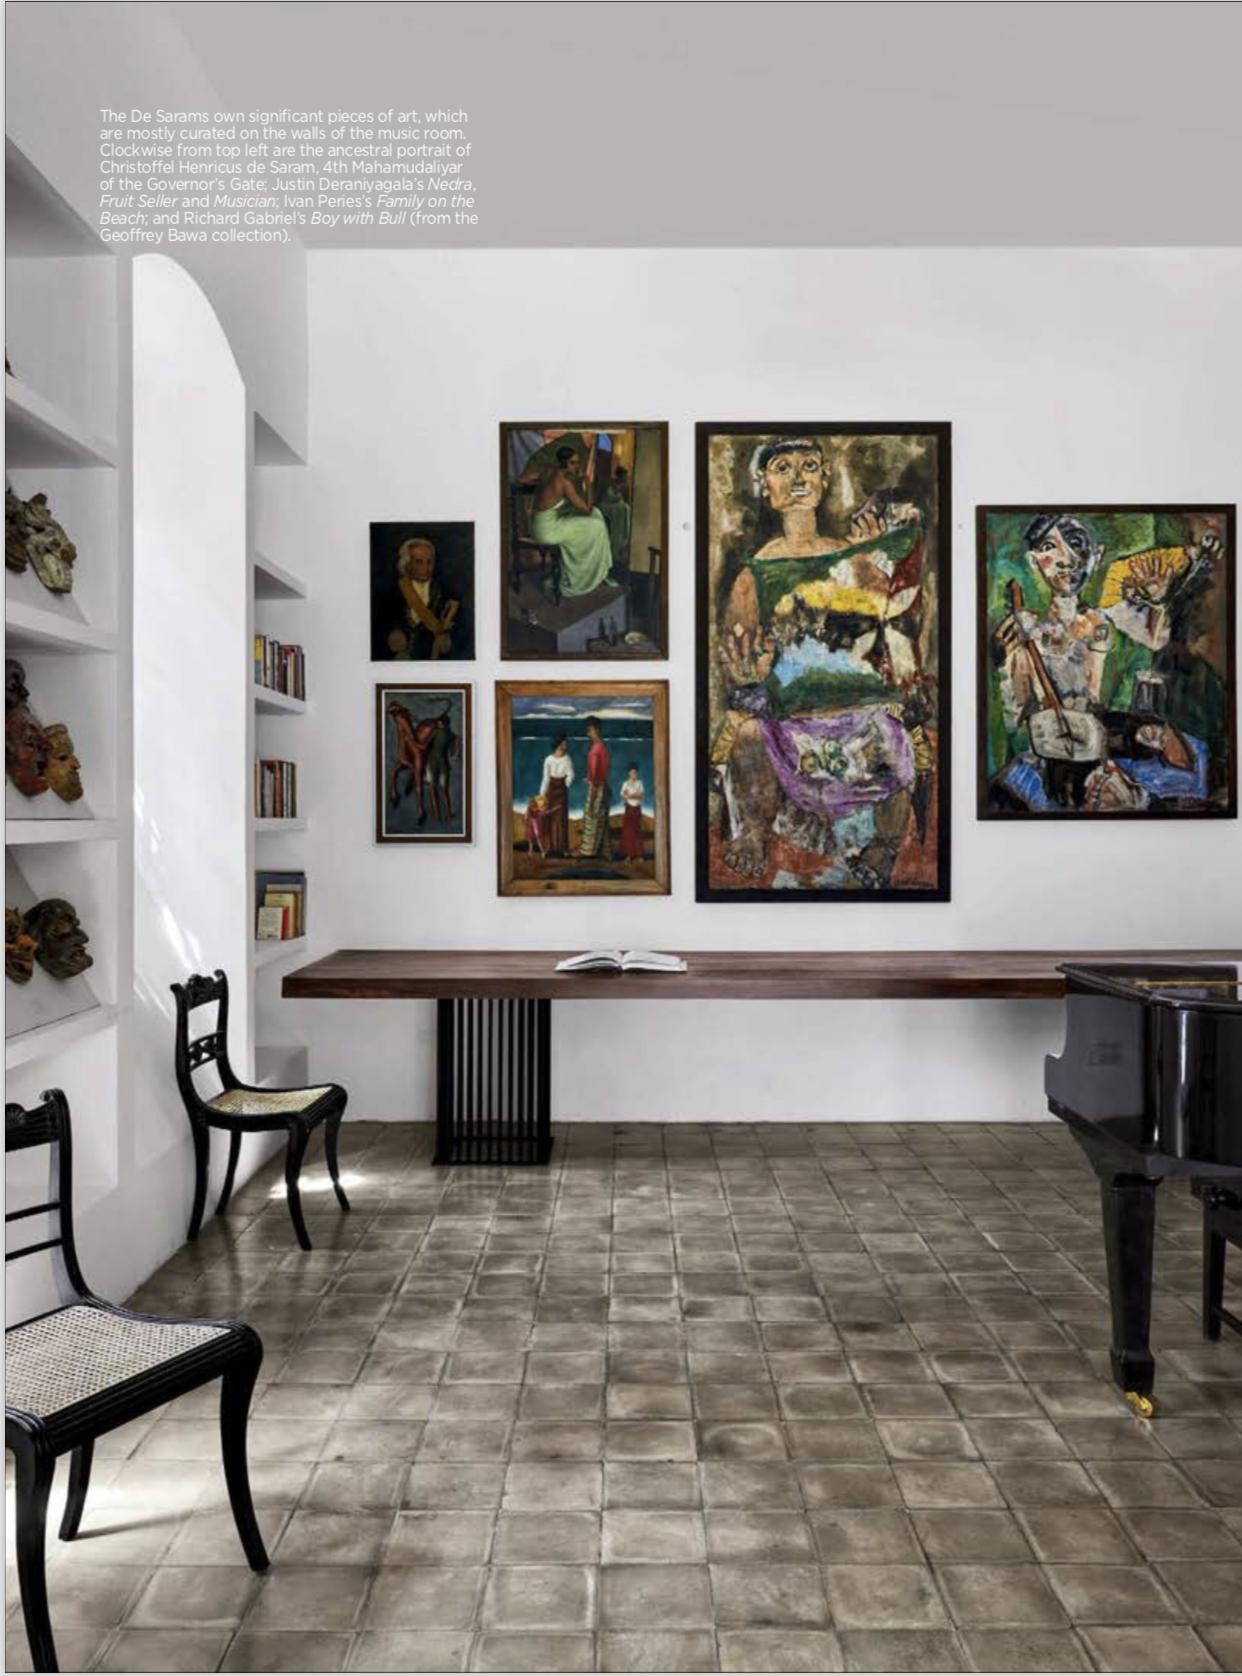 Music room with Deraniyagala paintings